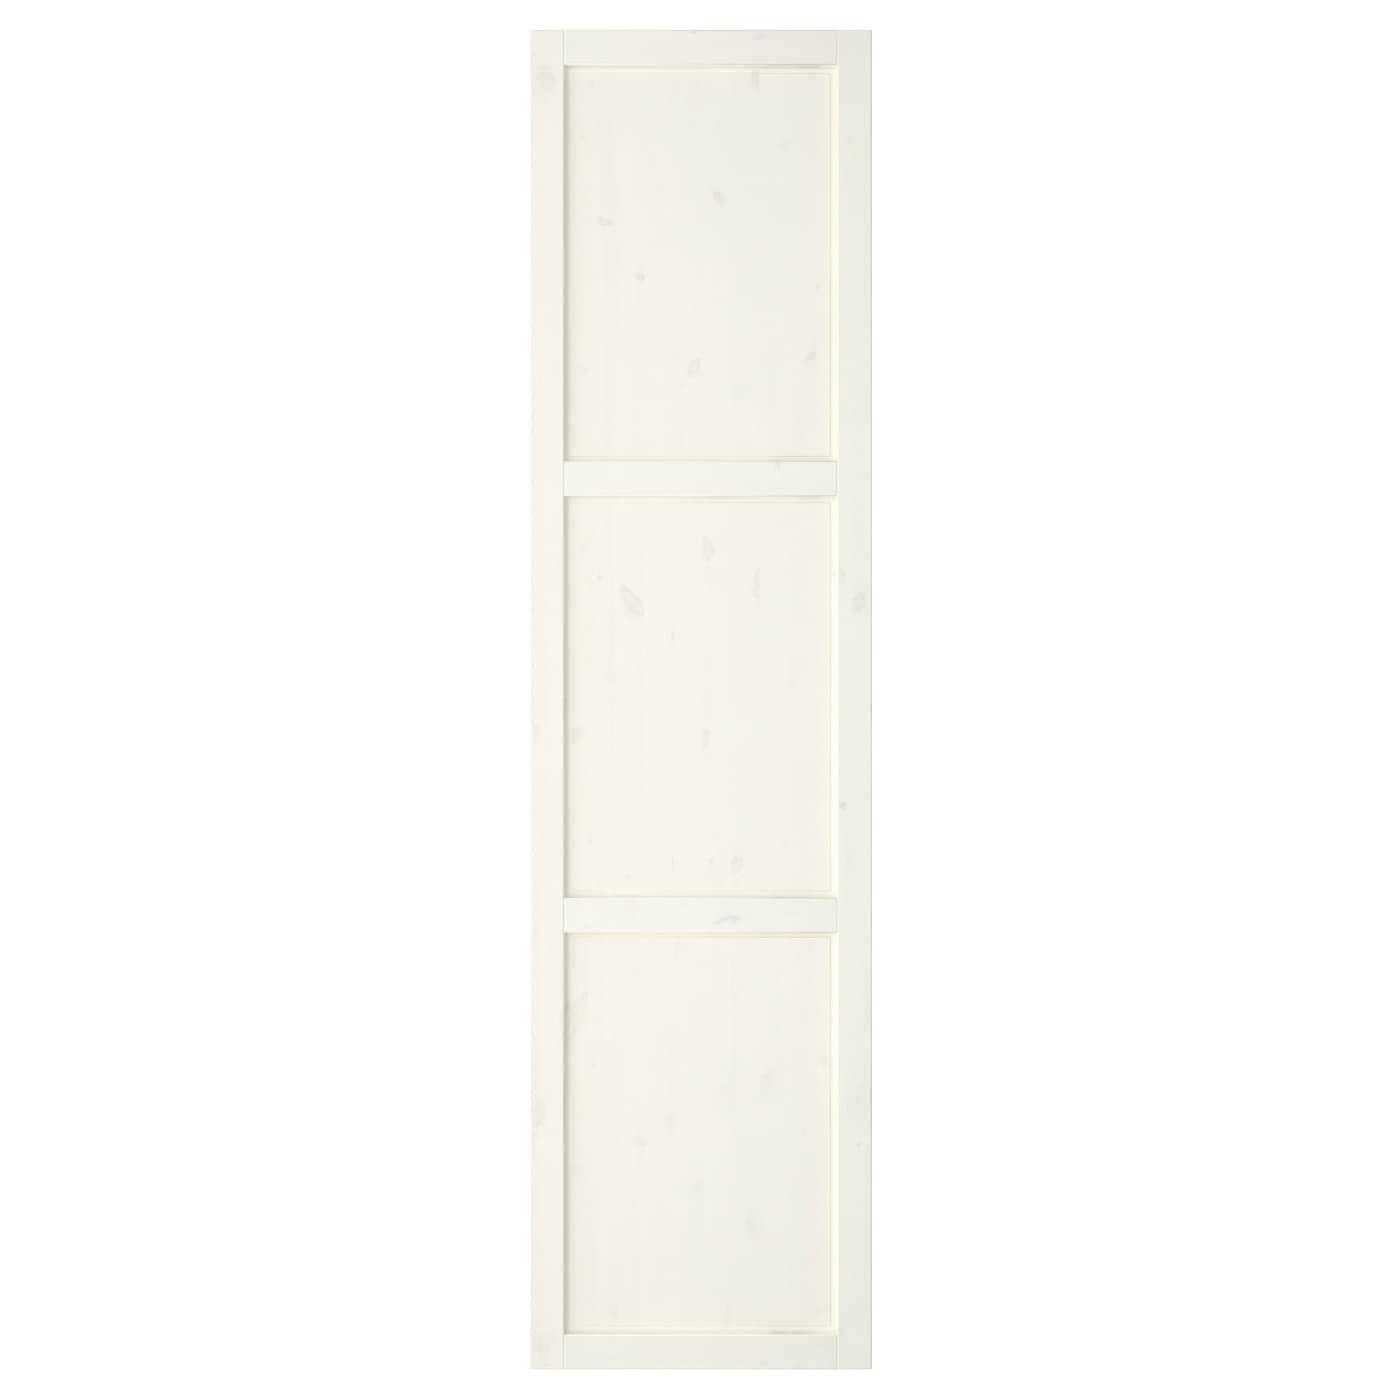 hemnes door with hinges white stain 50x195 cm ikea. Black Bedroom Furniture Sets. Home Design Ideas